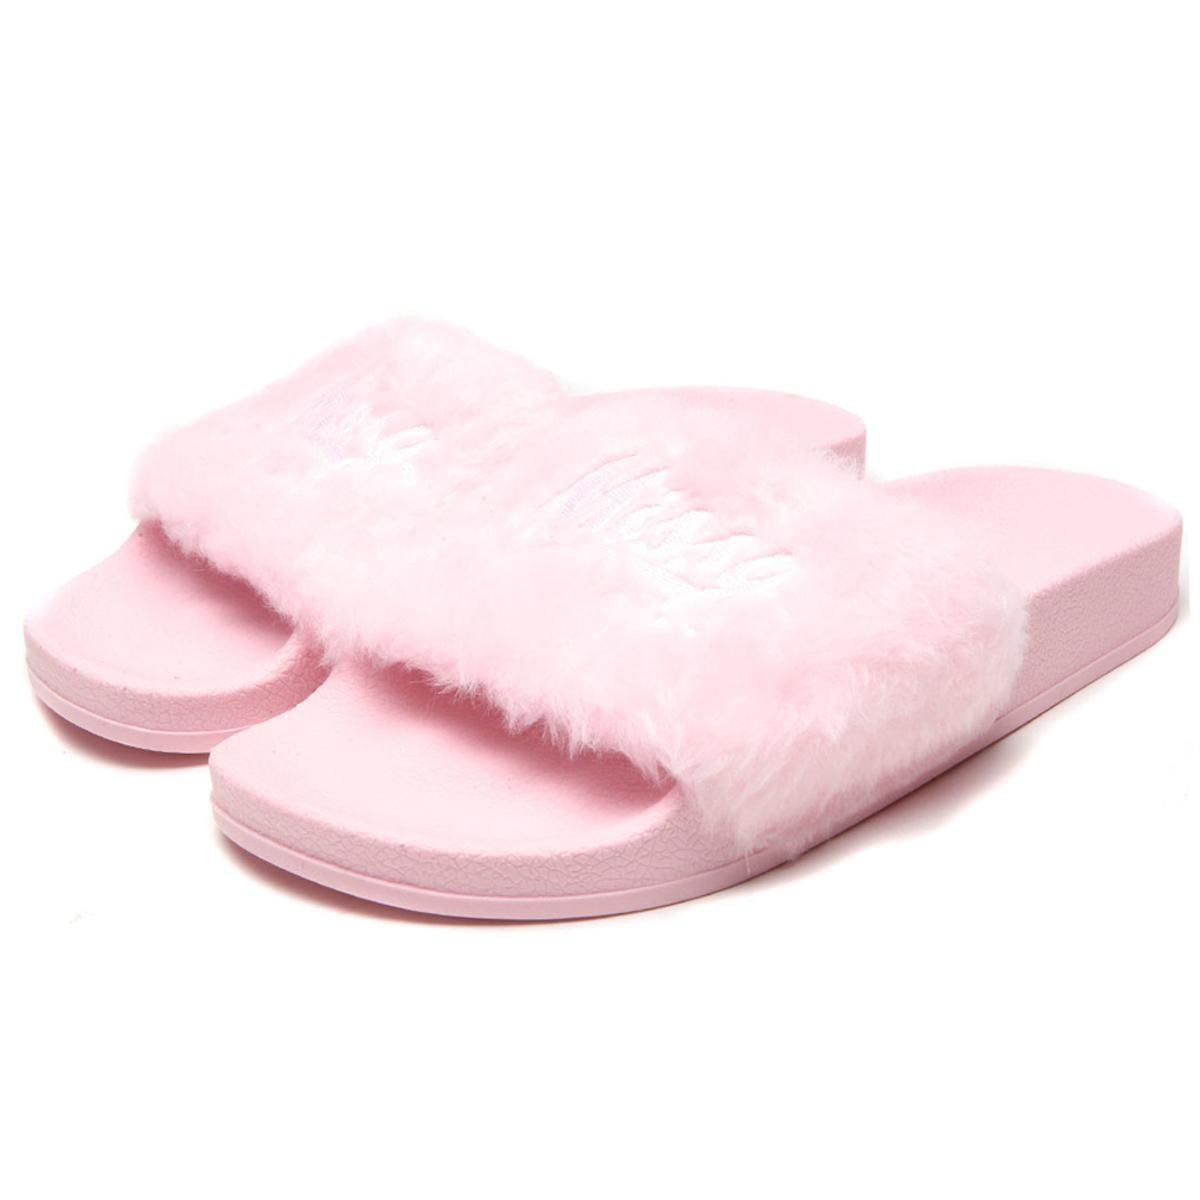 edeafb2e3fb3 Chinelo QIX Slide Missy Pelugem Feminino - Rosa - Compre Agora ...